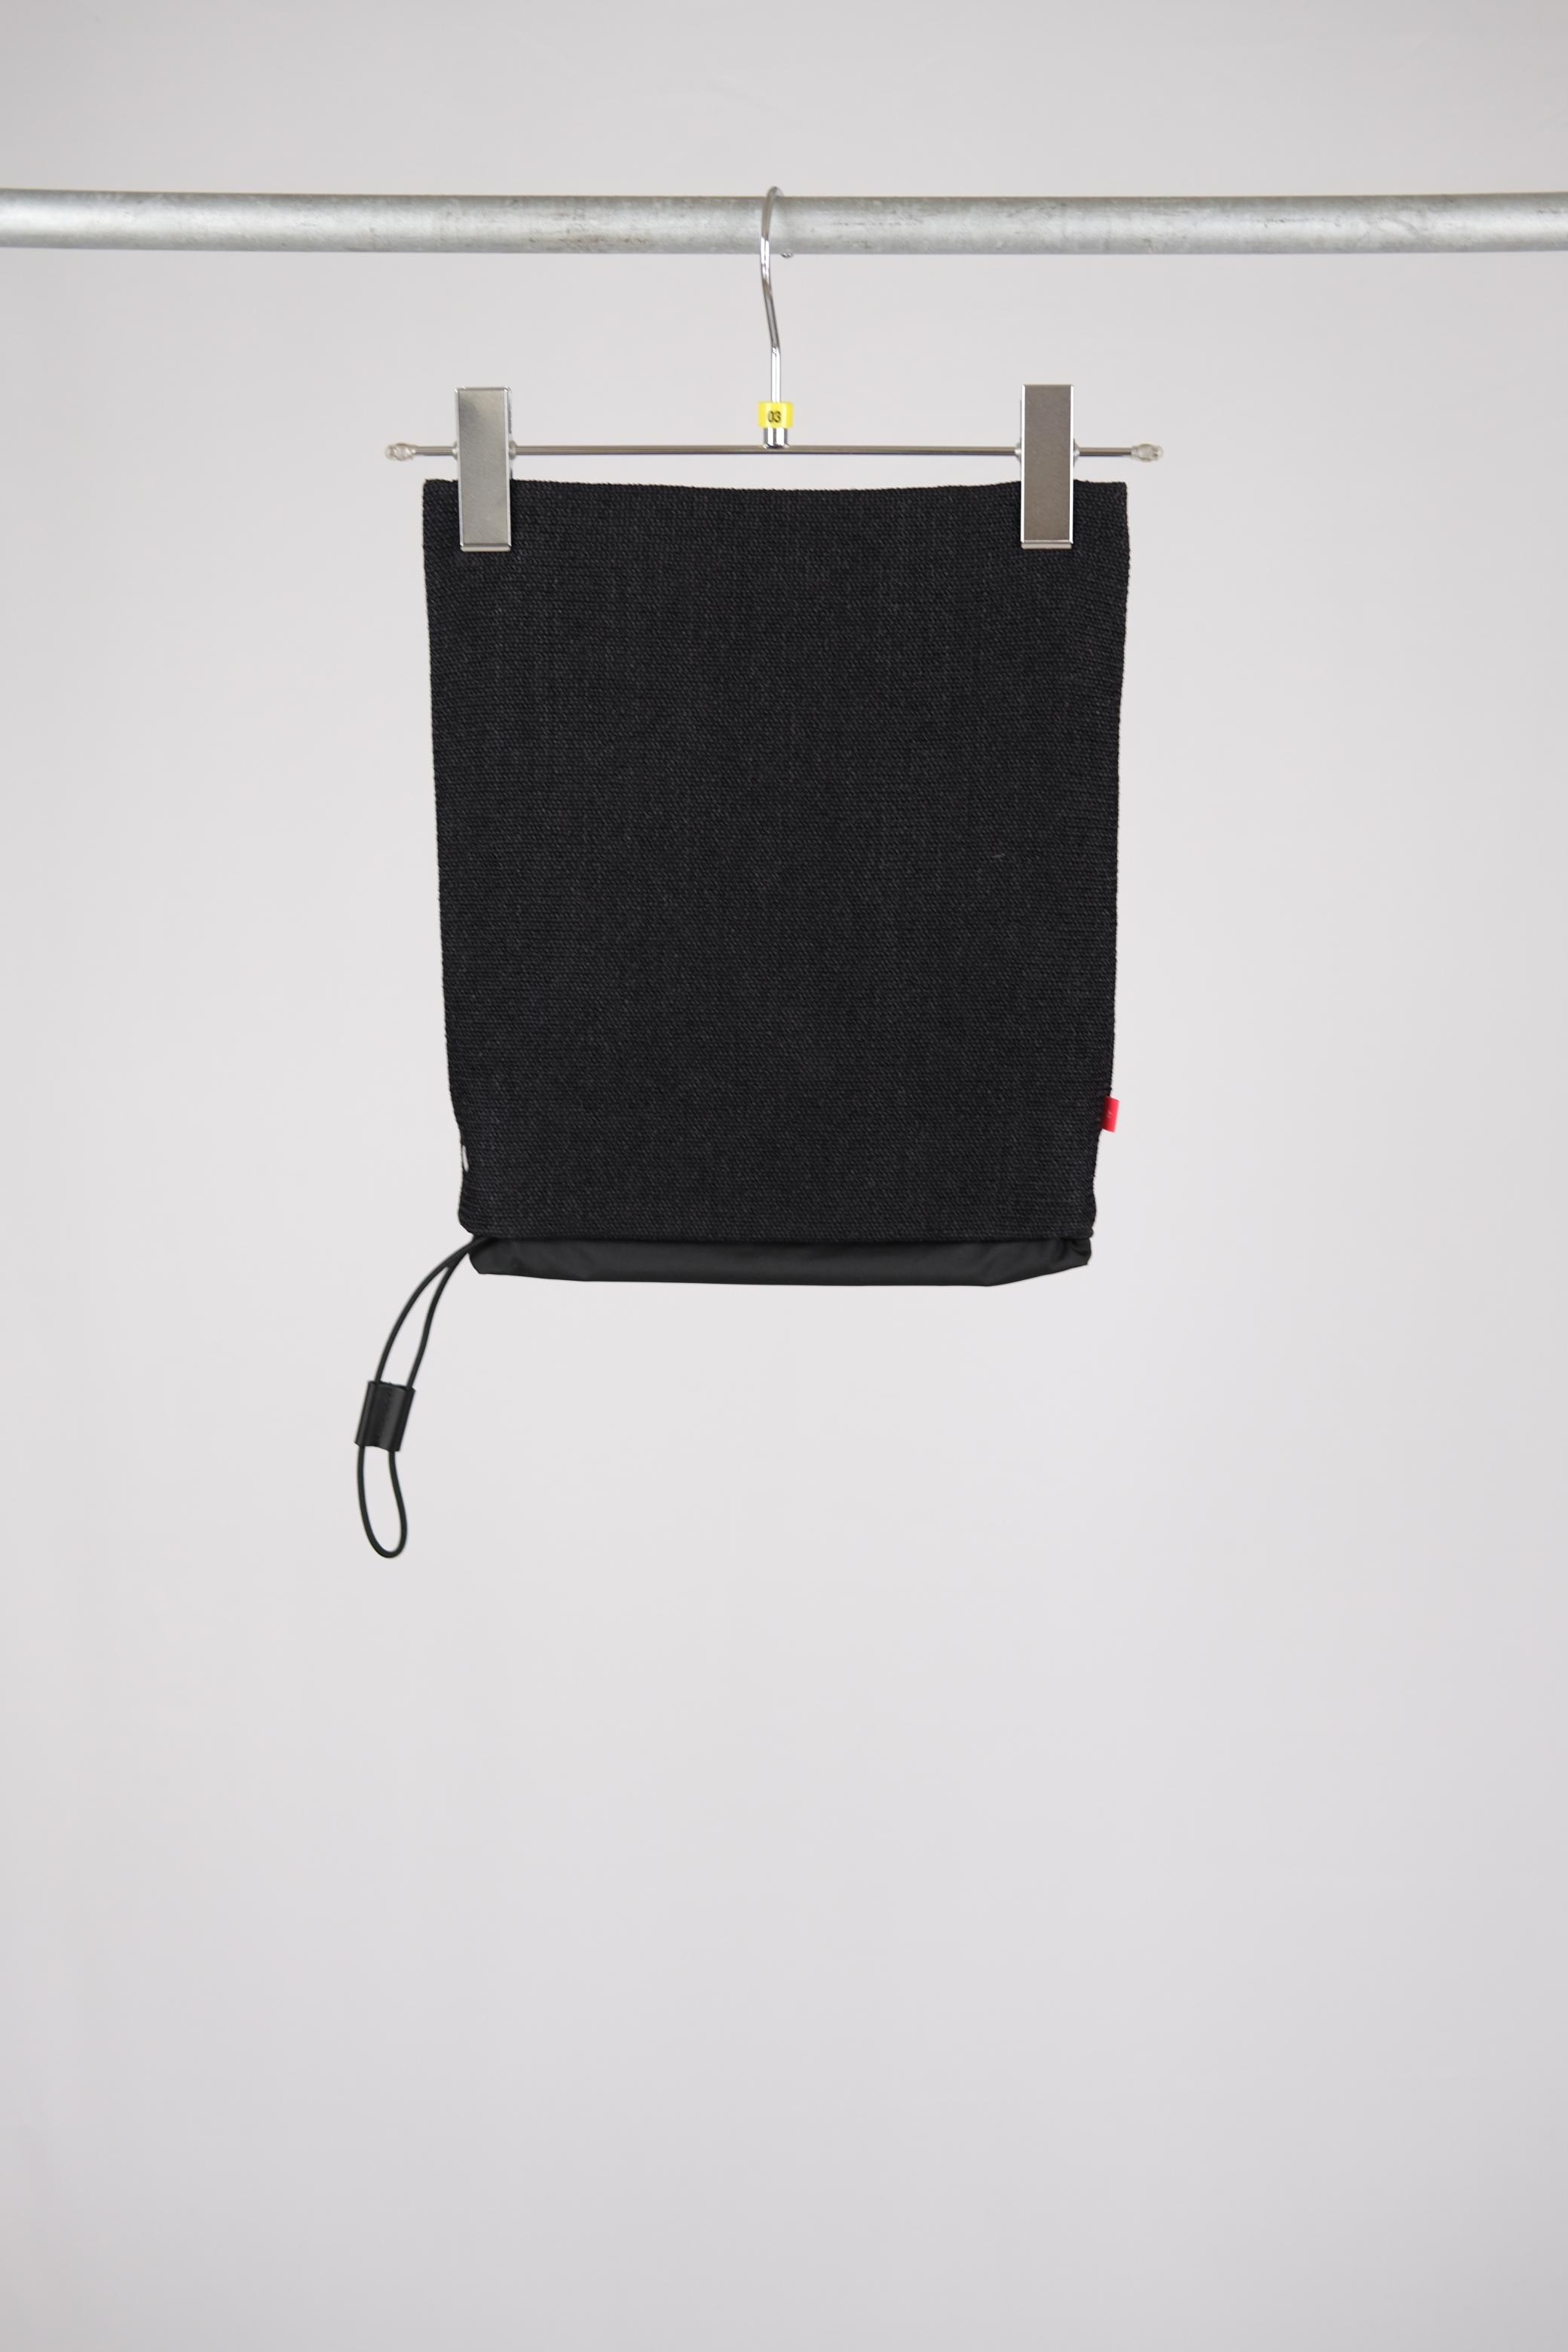 【AL】SHOULDER BAG - black(paper)